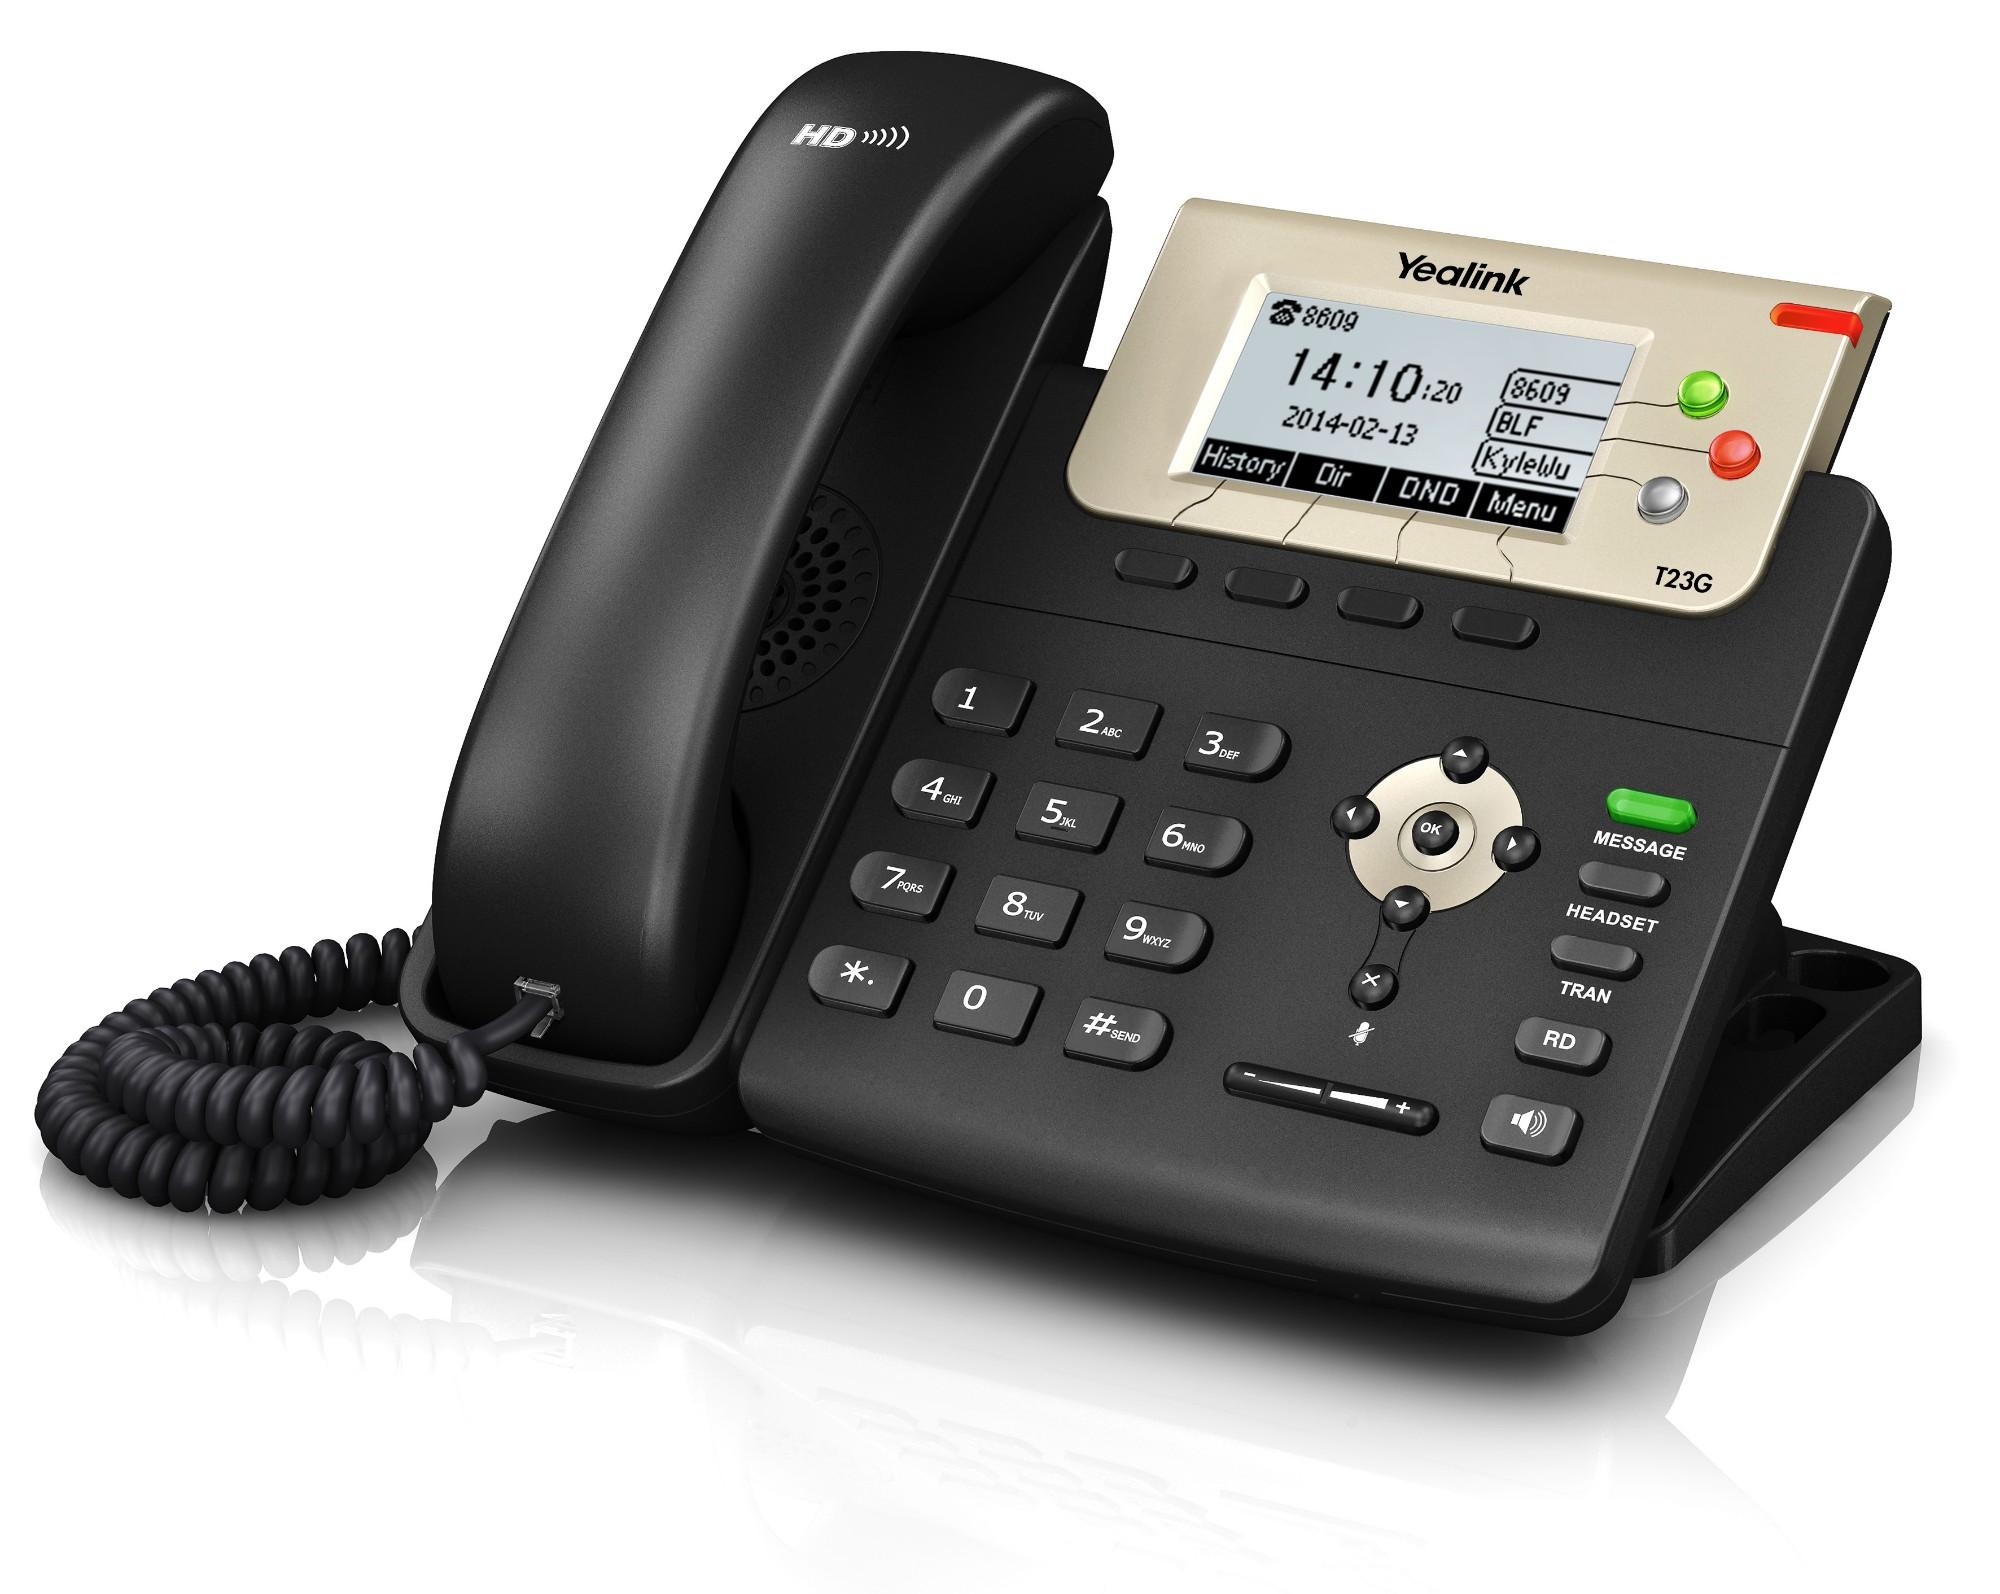 Yealink SIP-T23G IP phone Black Wired handset LCD